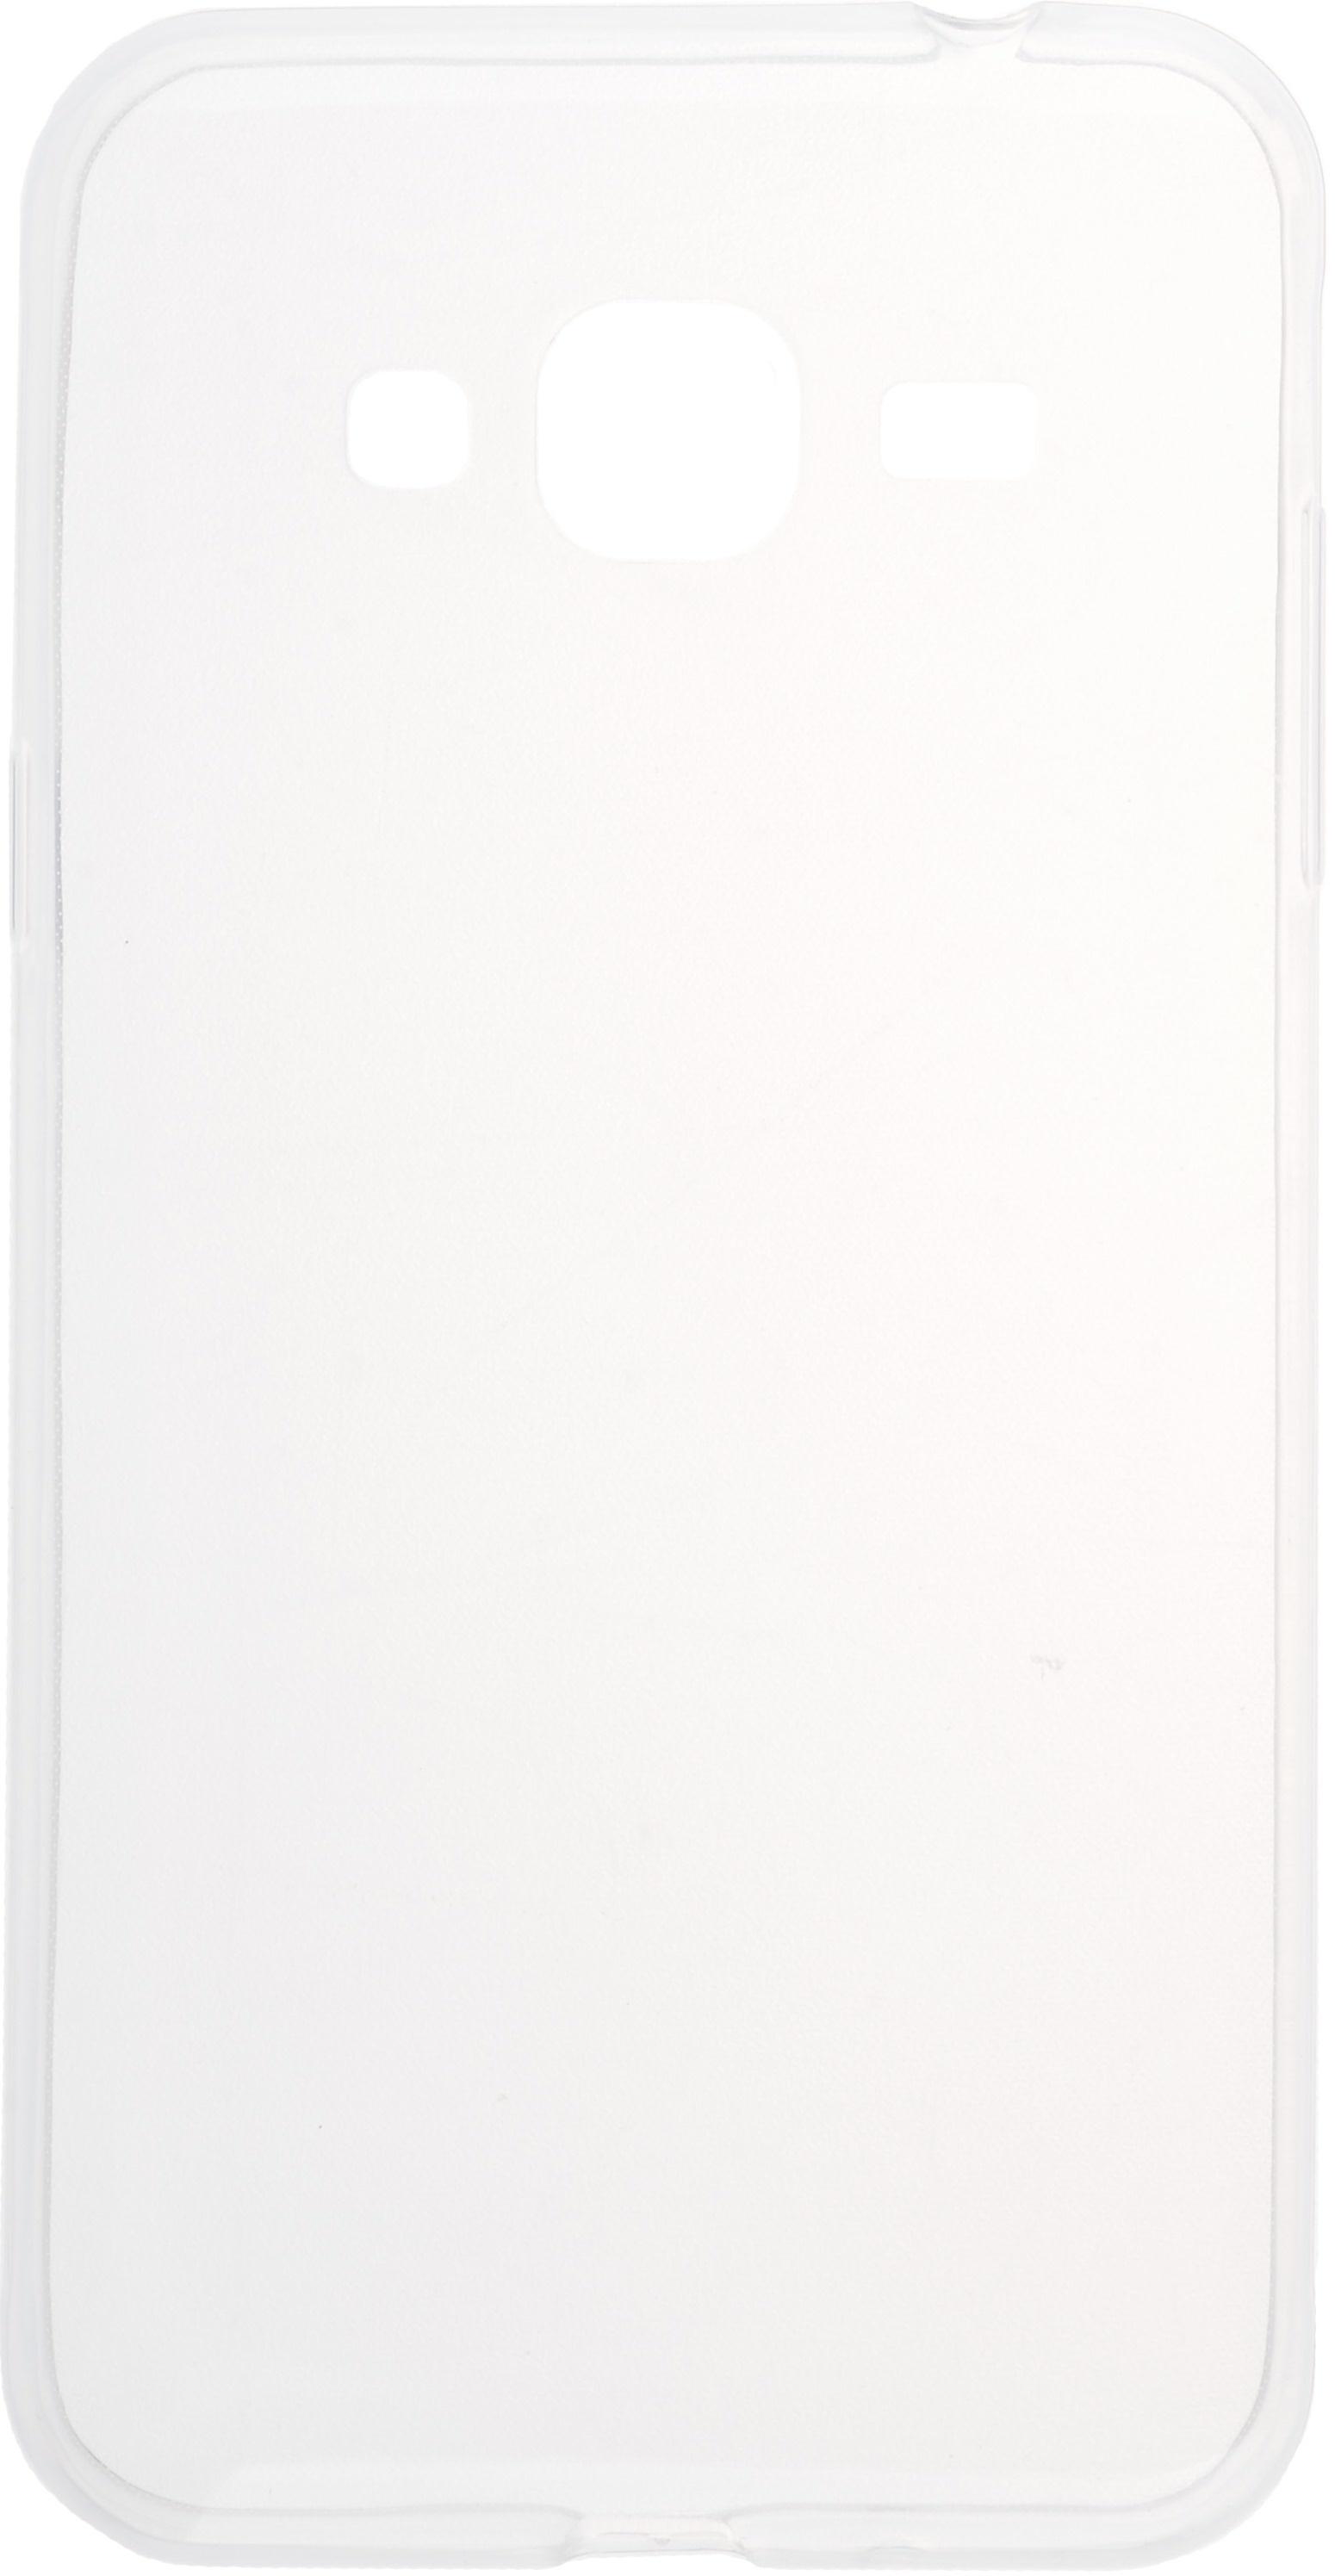 Чехол для сотового телефона skinBOX Slim Silicone, 4630042524859, прозрачный цена и фото